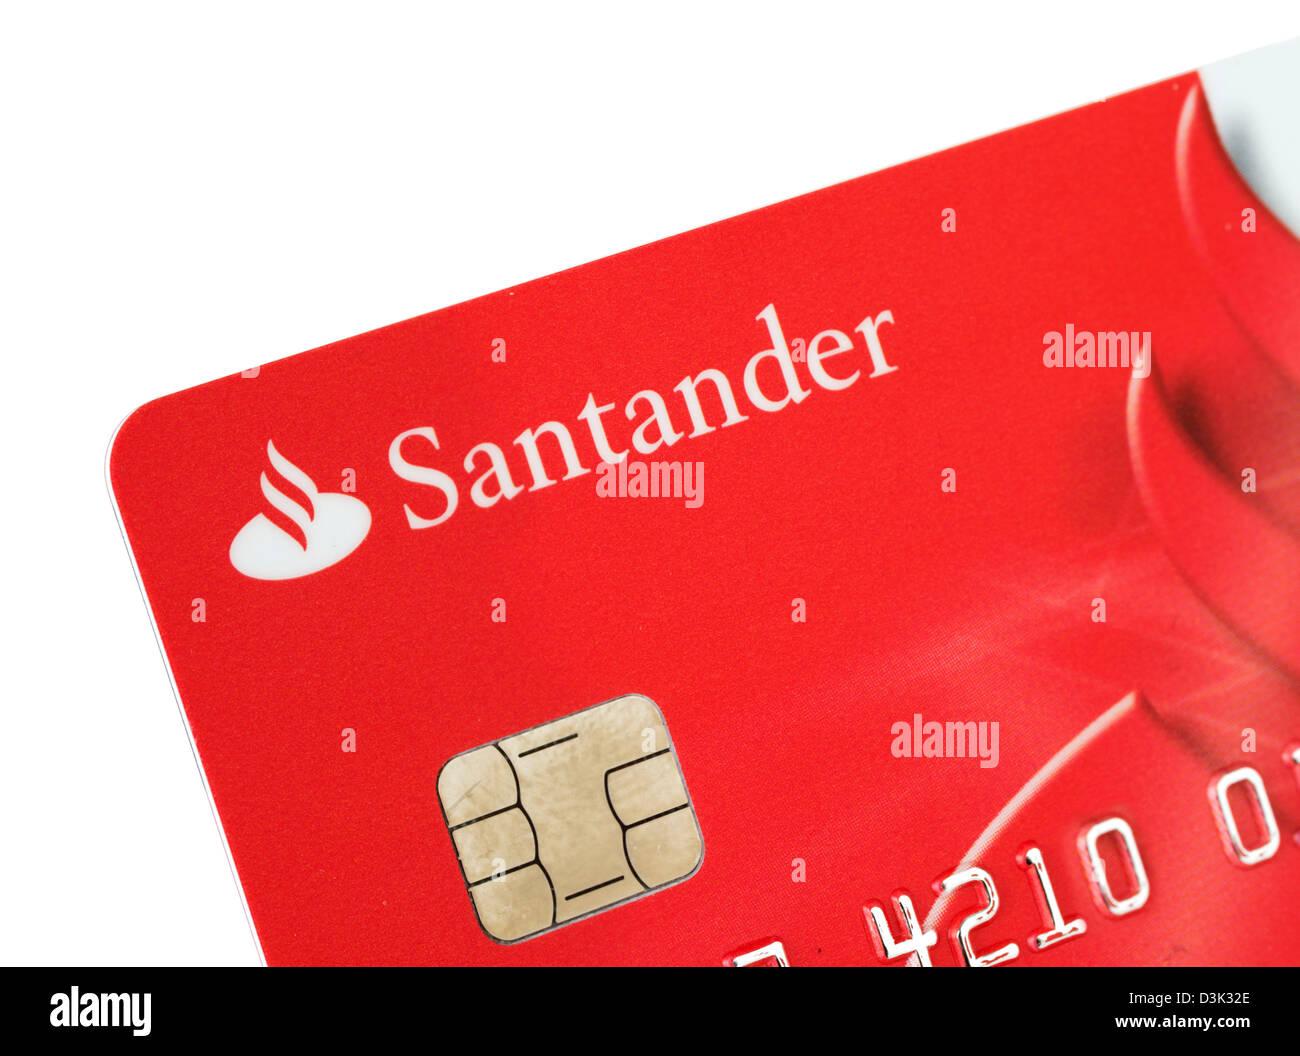 Santander Bank VISA debit card issued in the UK - Stock Image